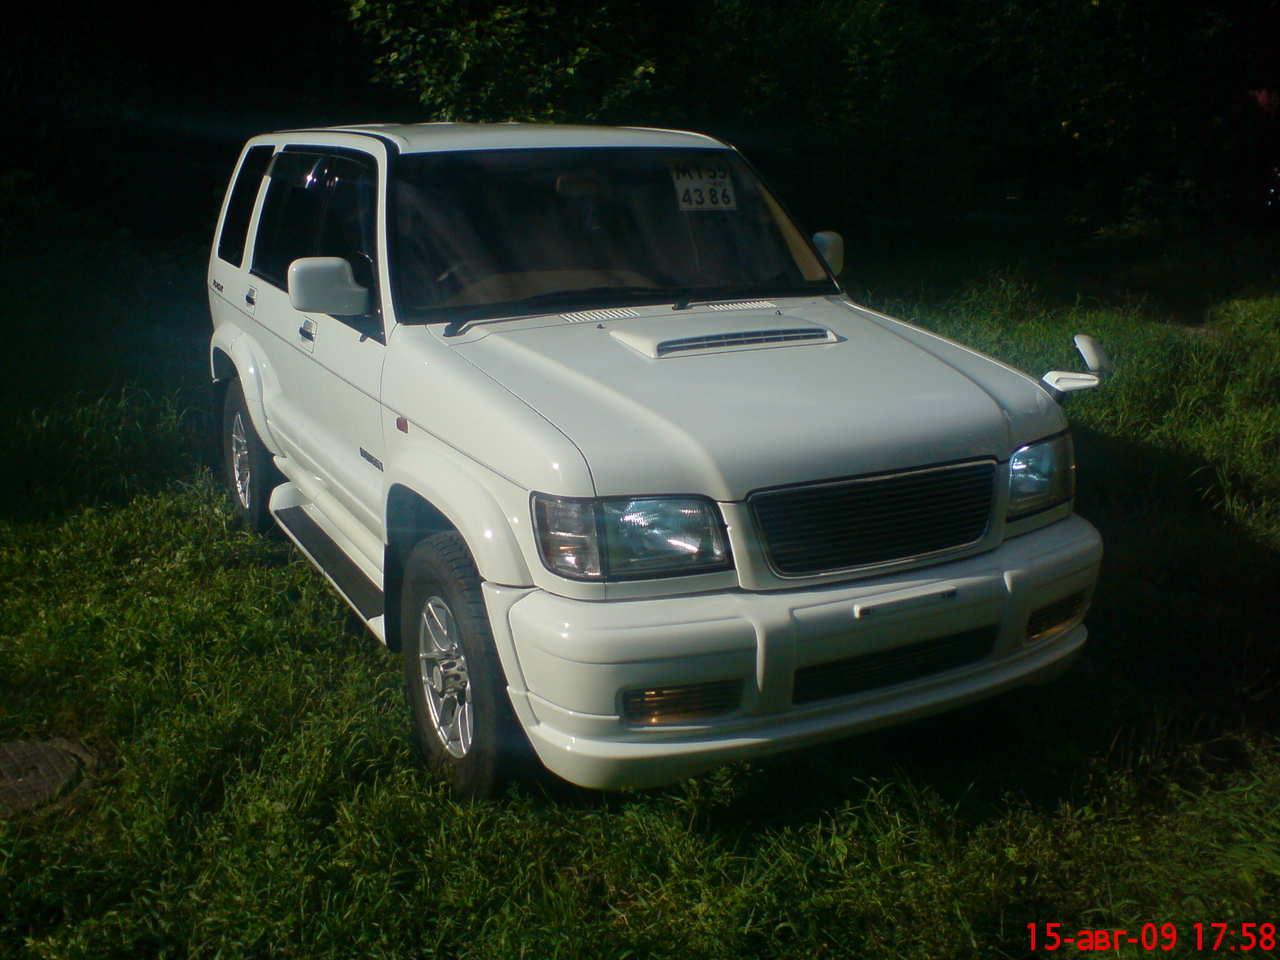 2000 Isuzu Bighorn For Sale 3 0 Diesel Automatic For Sale